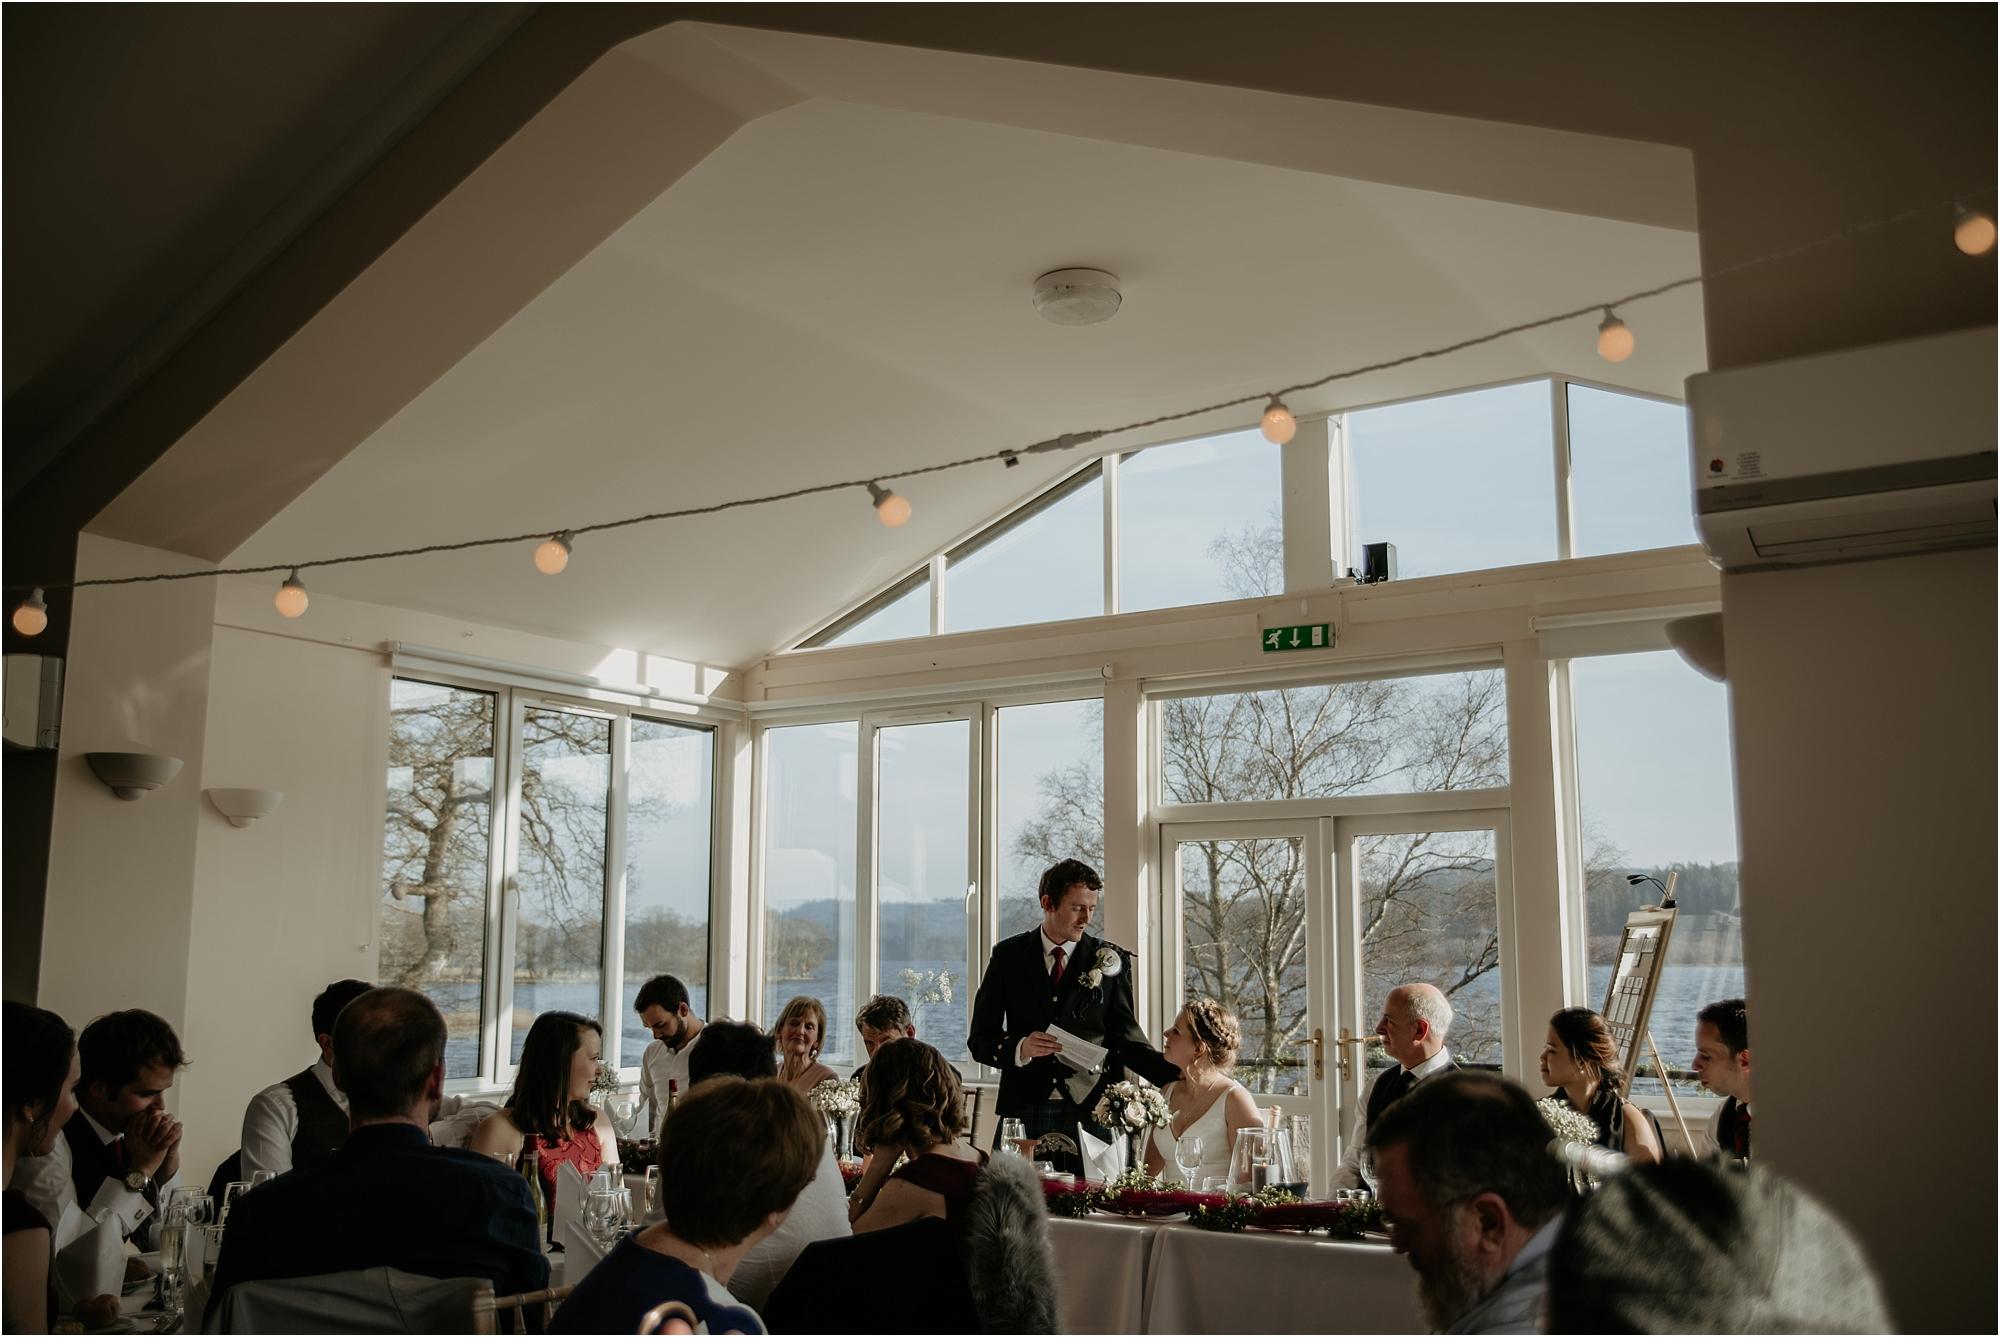 Kinlochard-village-hall-scottish-wedding-claire-fleck-photography__0087.jpg